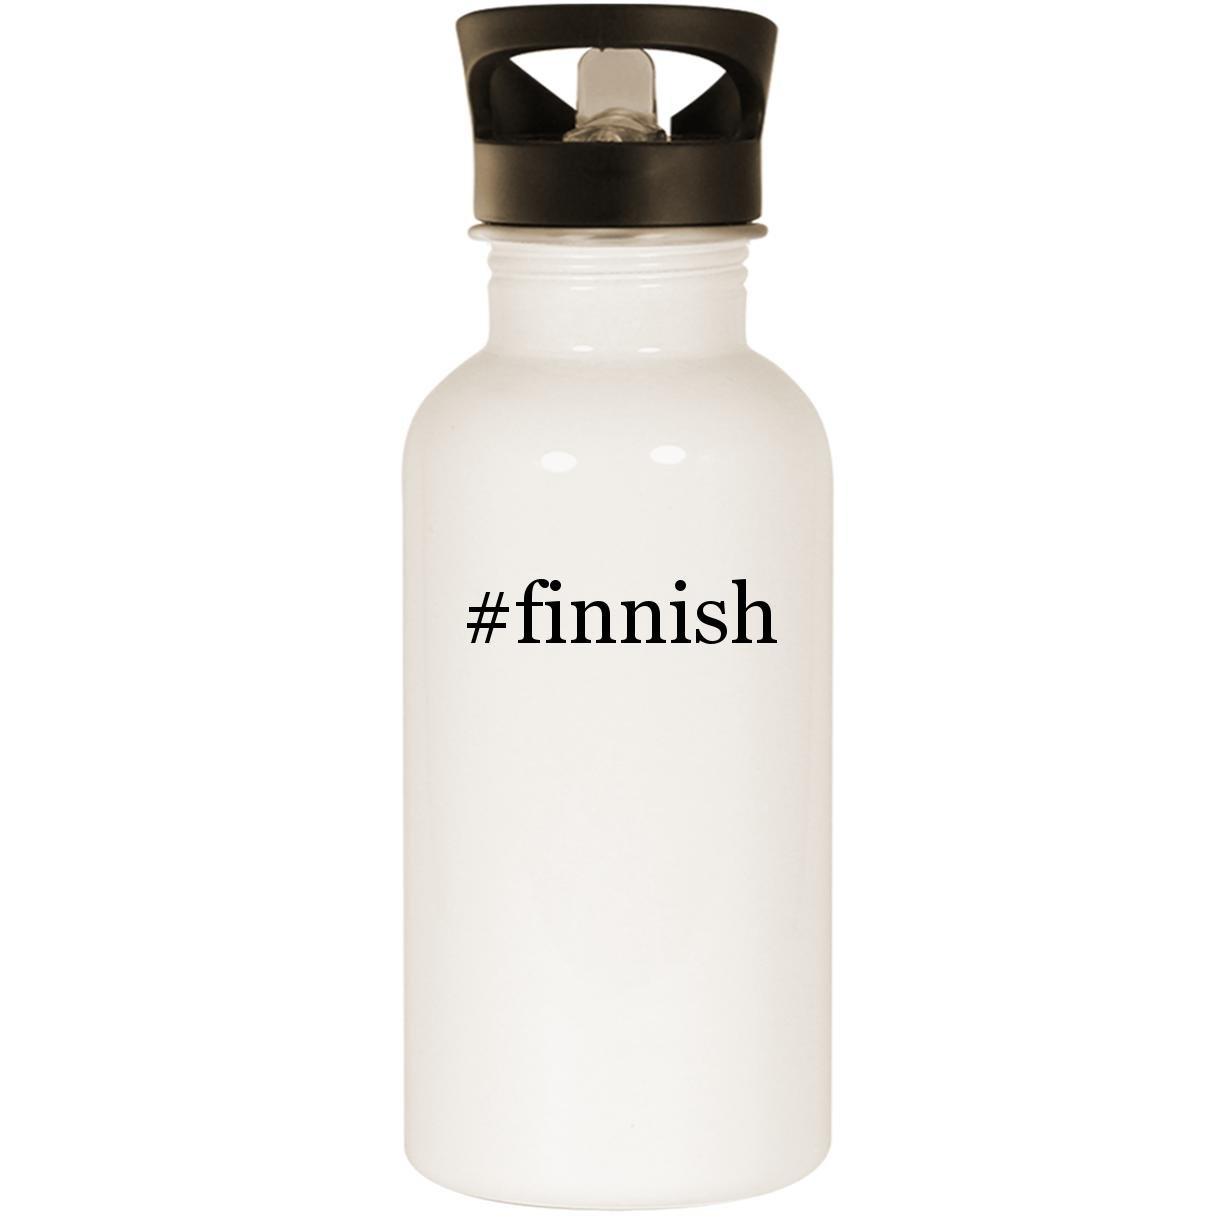 # Finnish – ステンレススチール20oz Road Ready水ボトル ホワイト US-C-07-18-02-021526-04-26-19-26 B07FSZZBBQ ホワイト